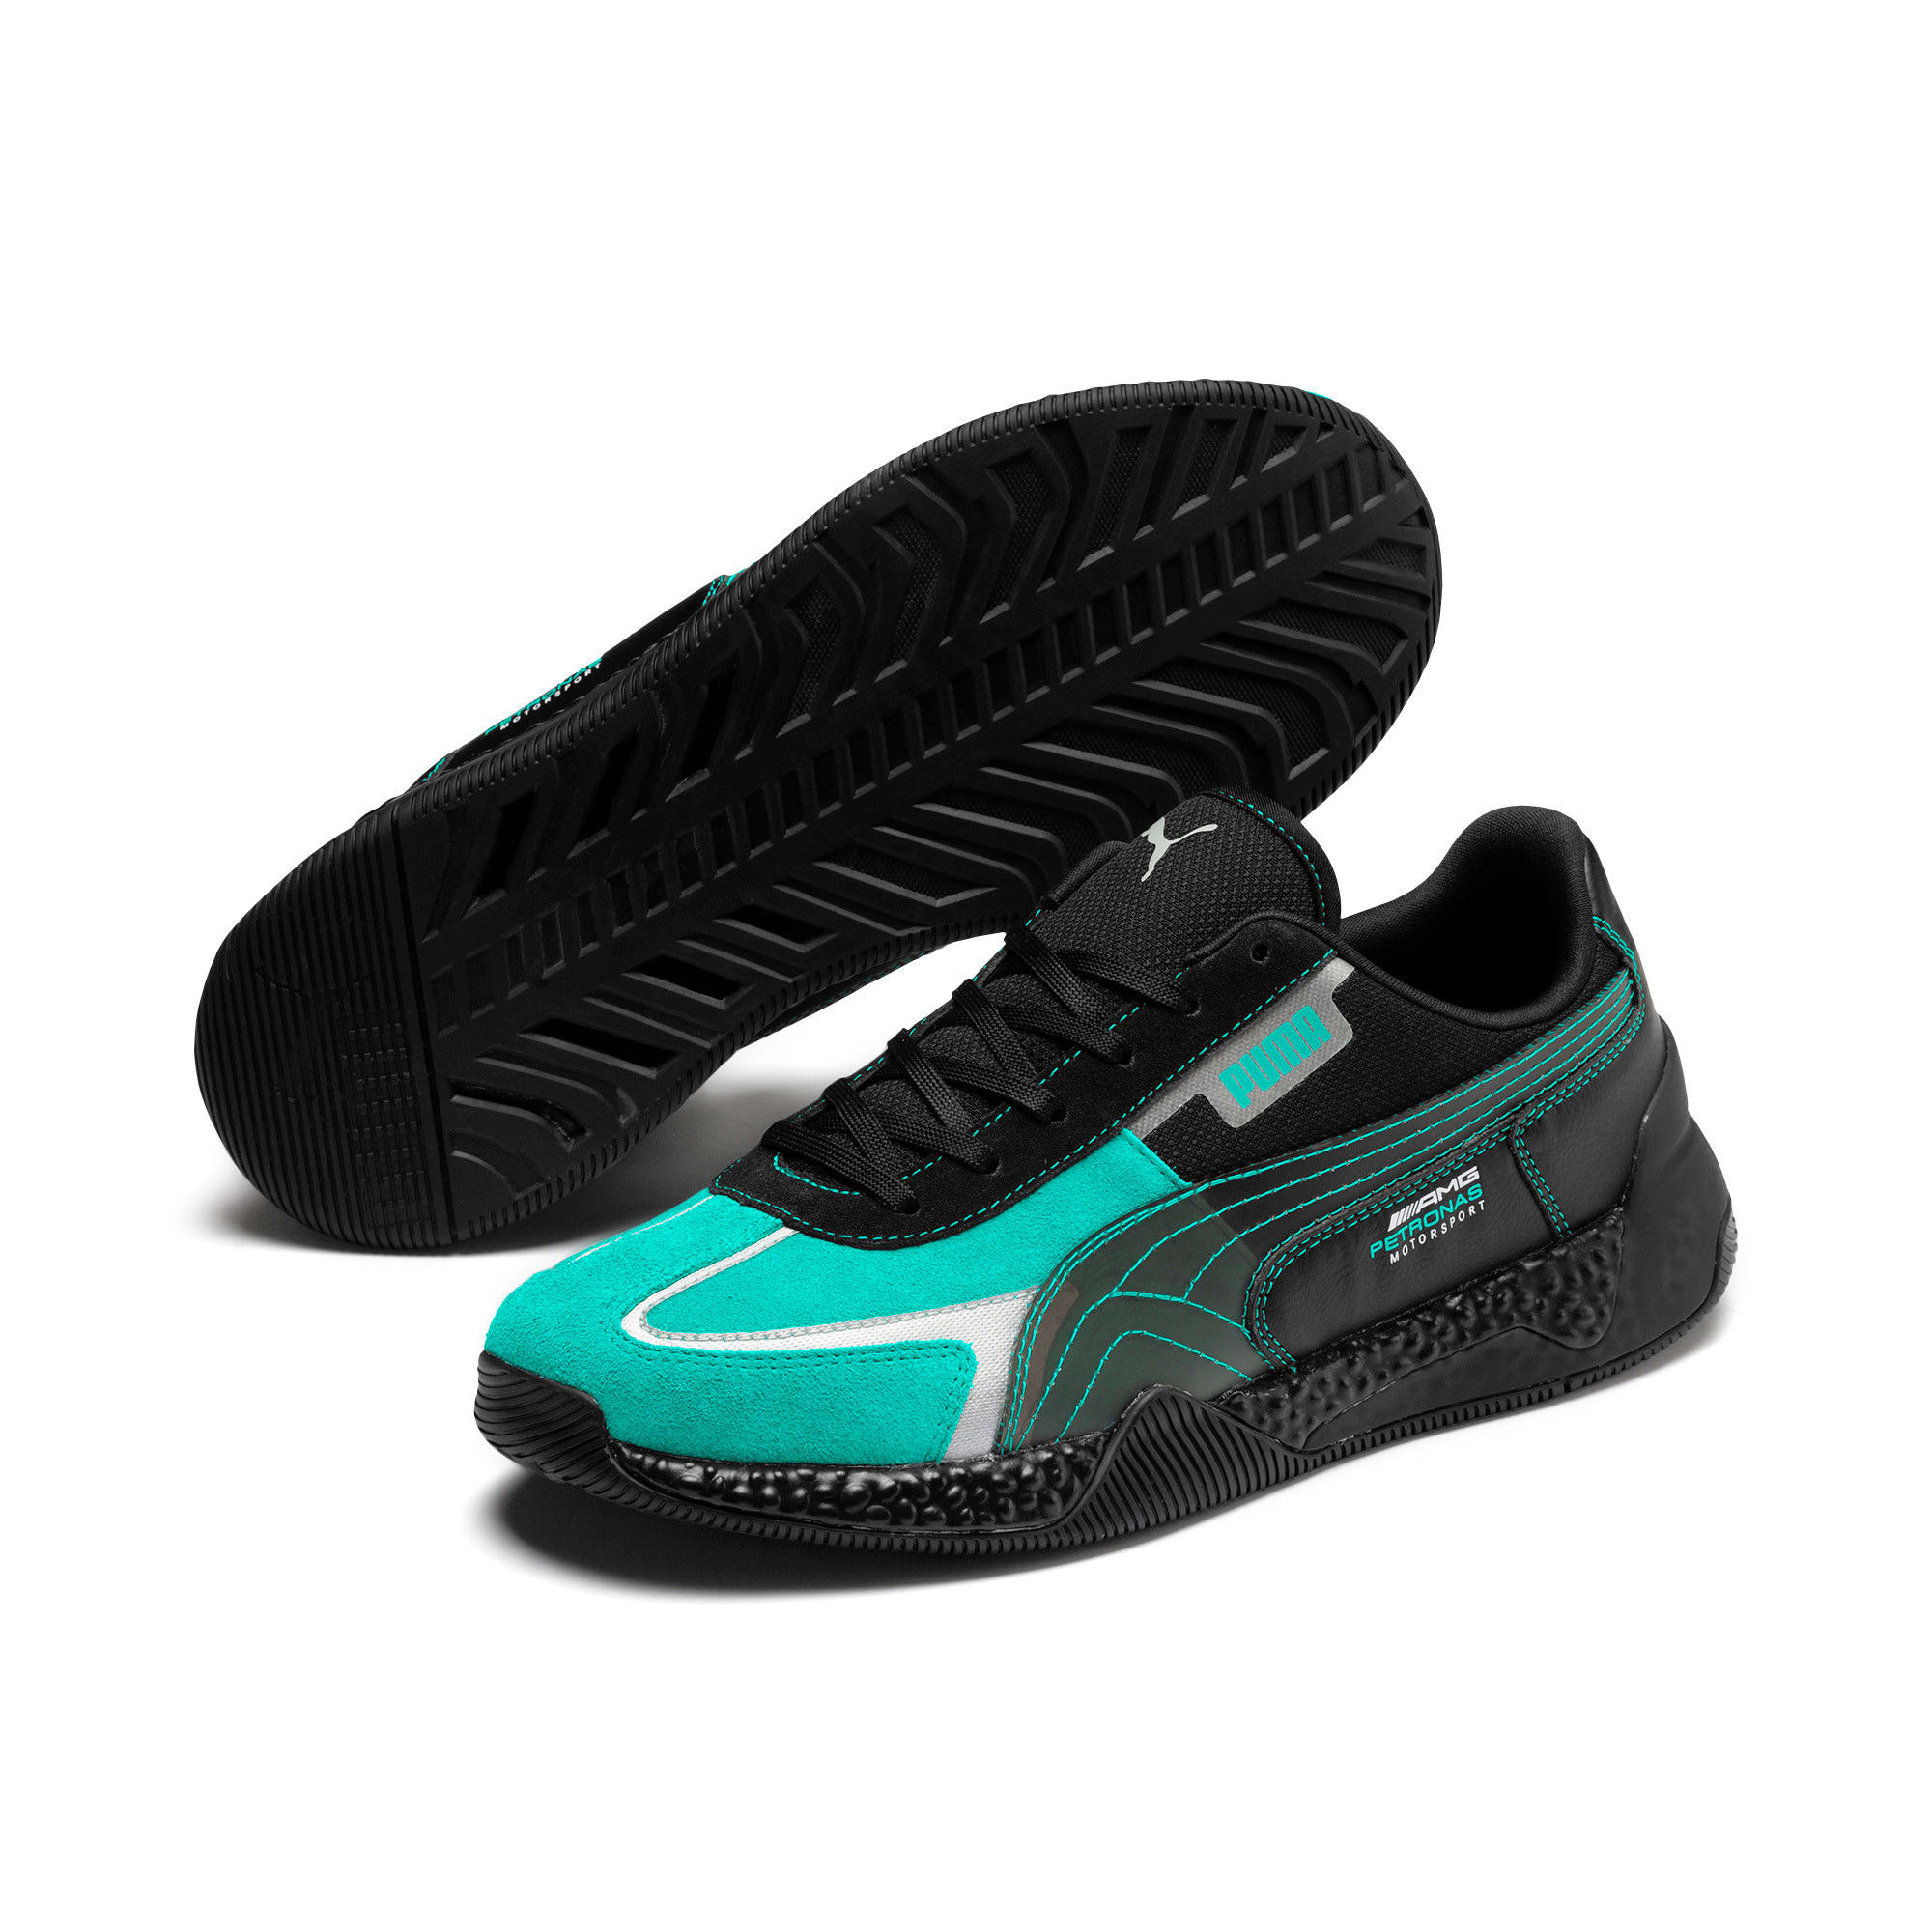 Thumbnail 3 of Mercedes AMG Petronas Speed HYBRID Running Shoes, Puma Black-Spectra Green, medium